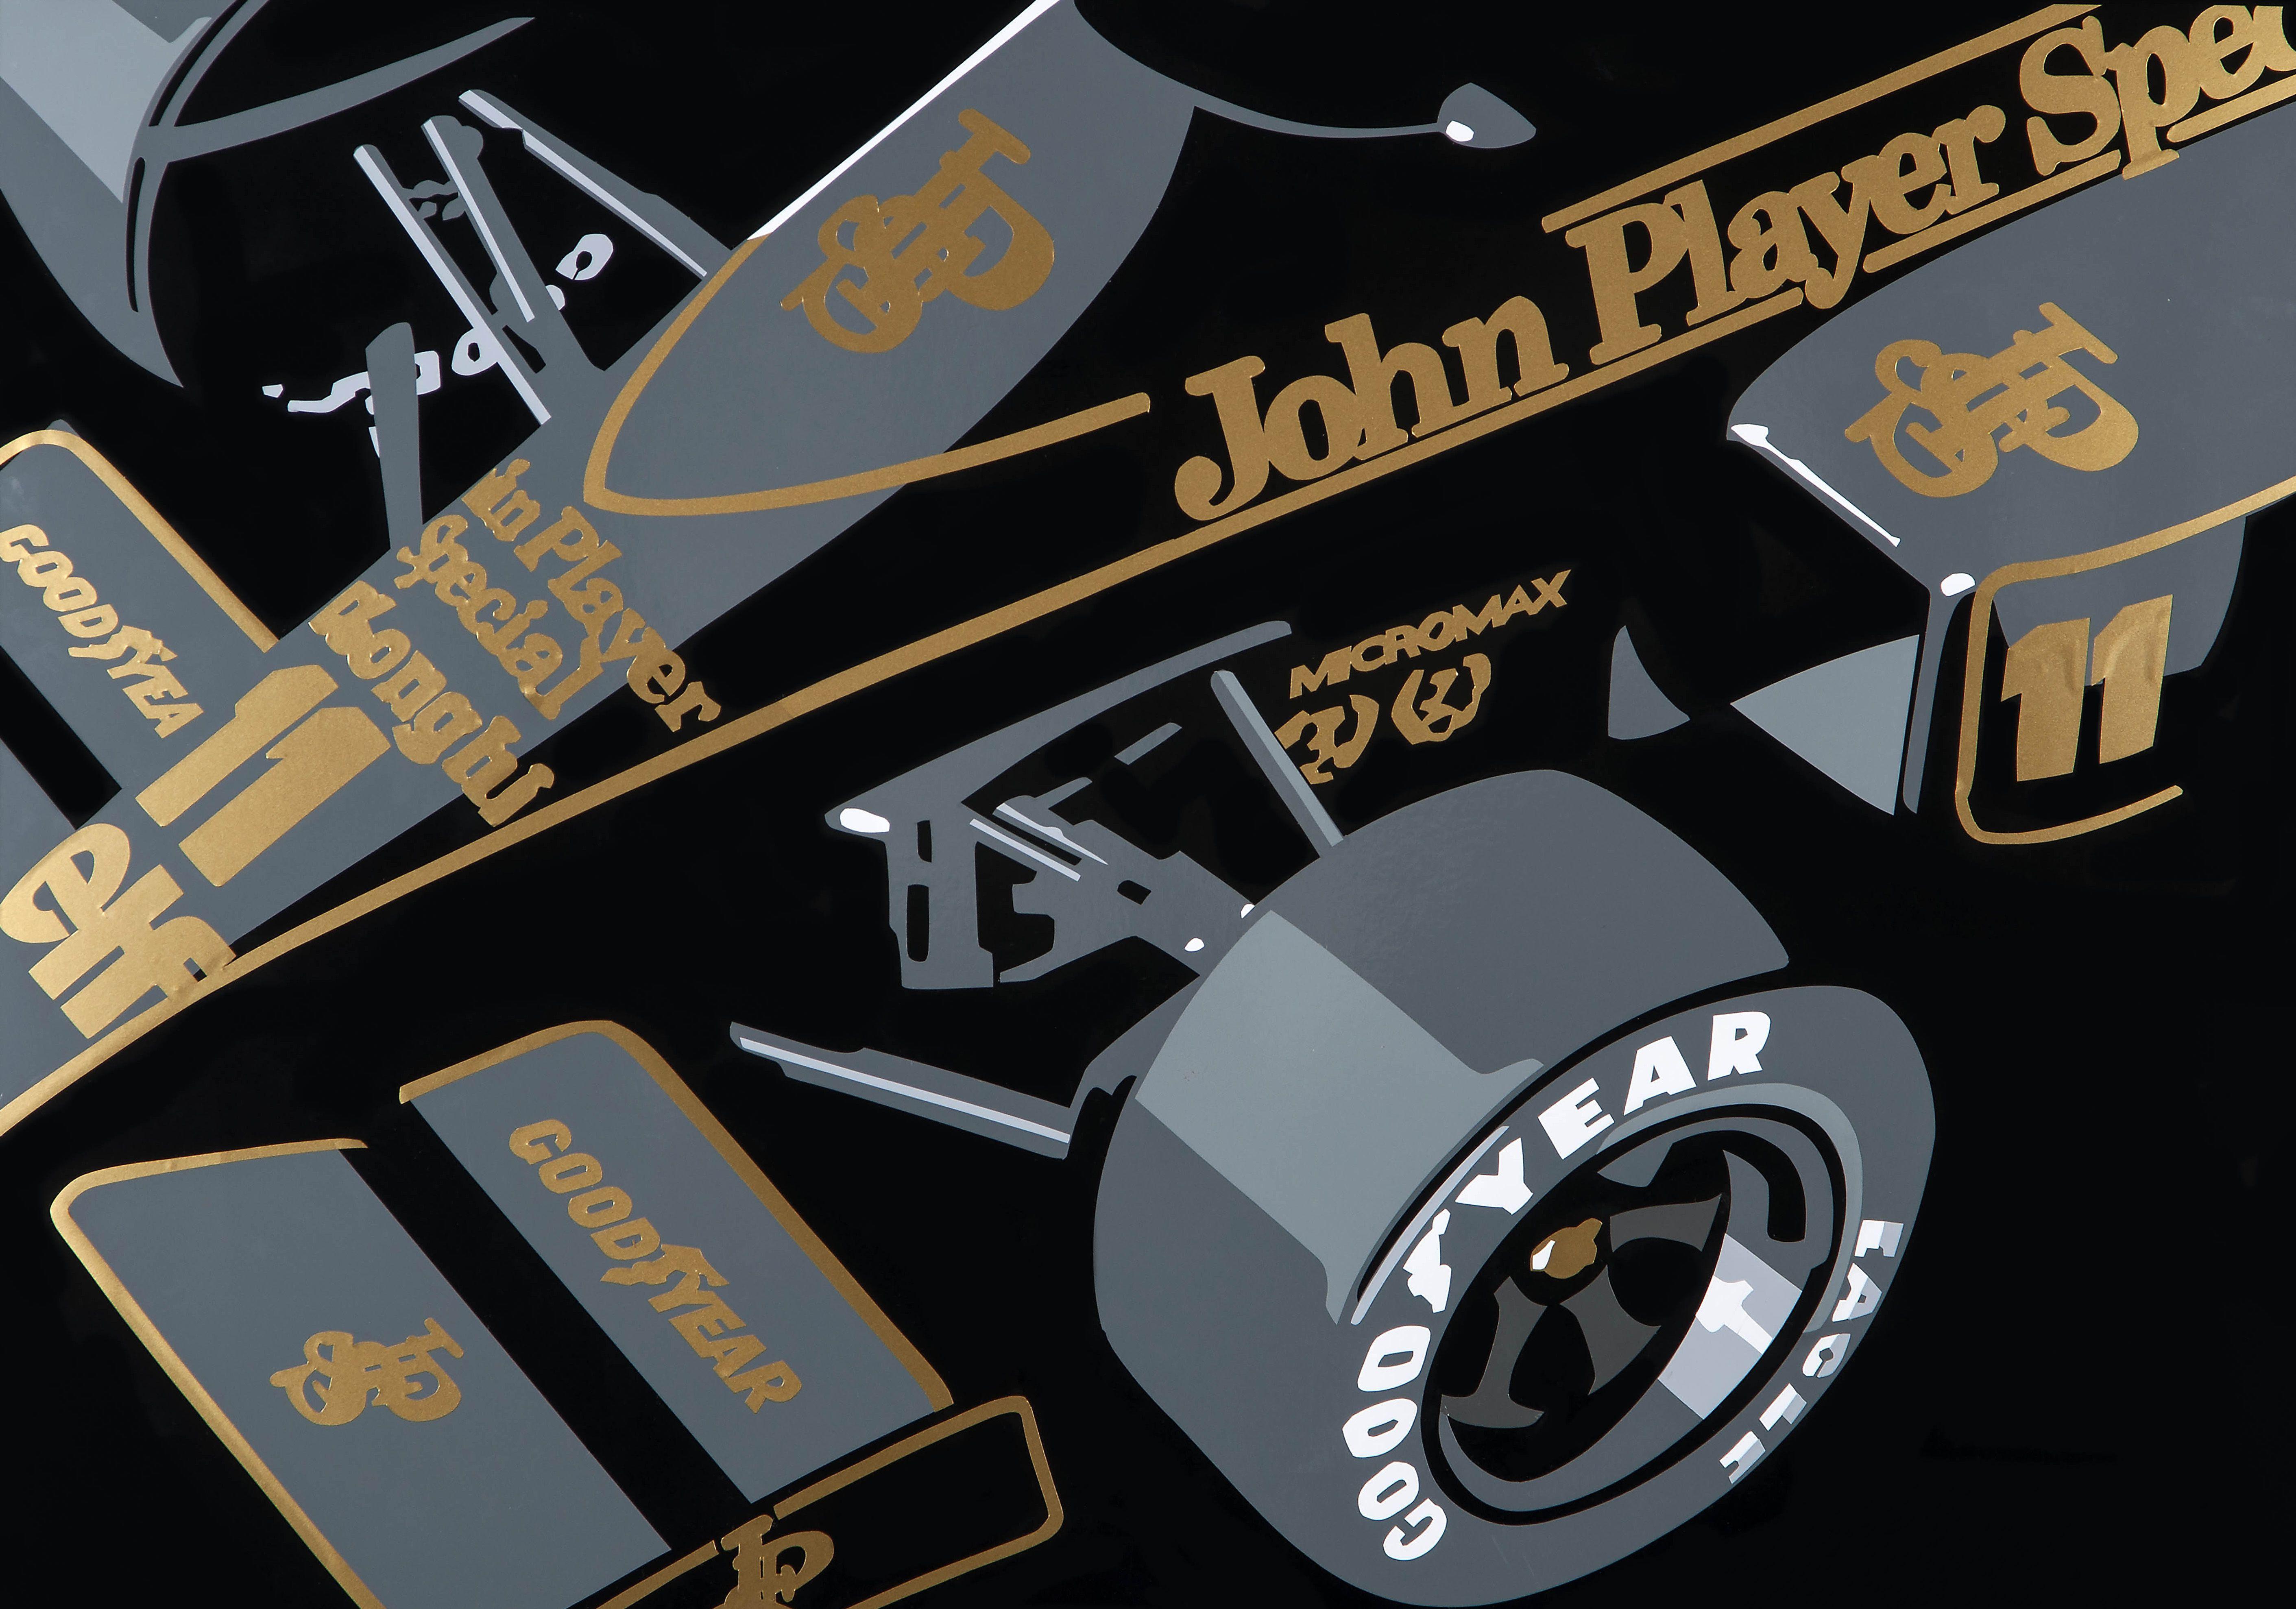 JPS Lotus F1. Hand-cut vinyl art, by www.joelclarkartist.carbonmade ...